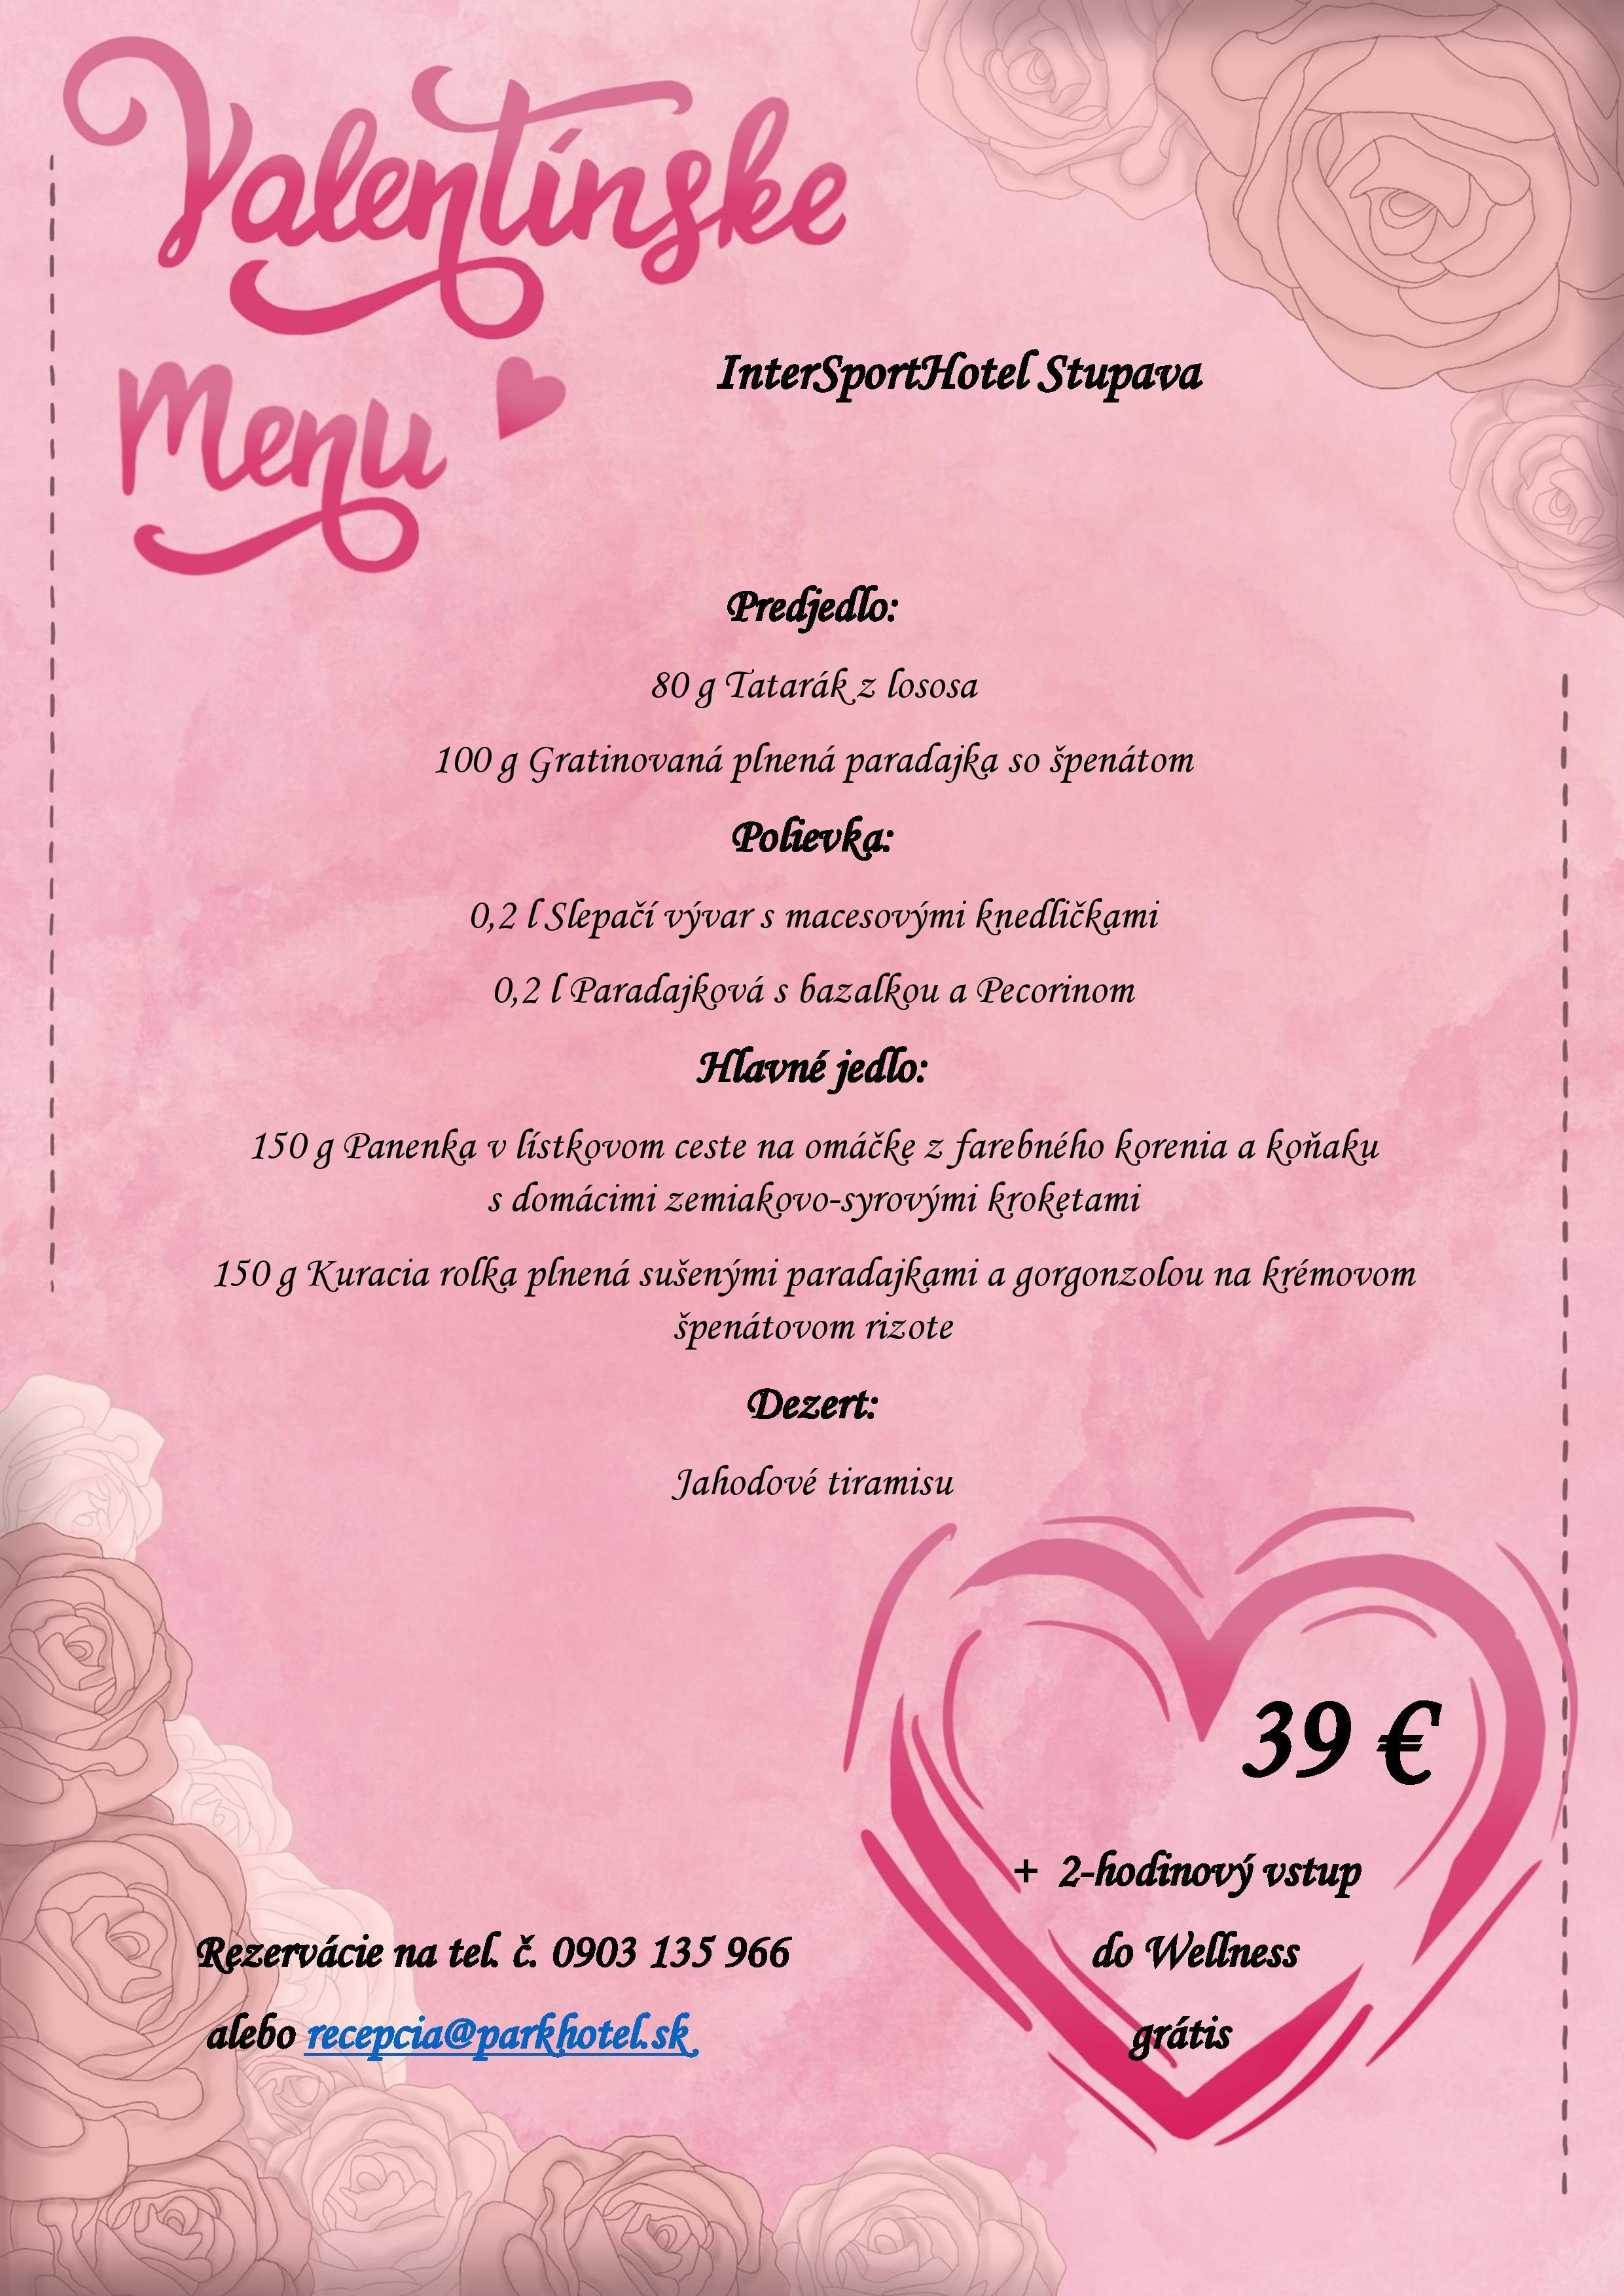 Valentínske-menu-intersport-hotel-stupava